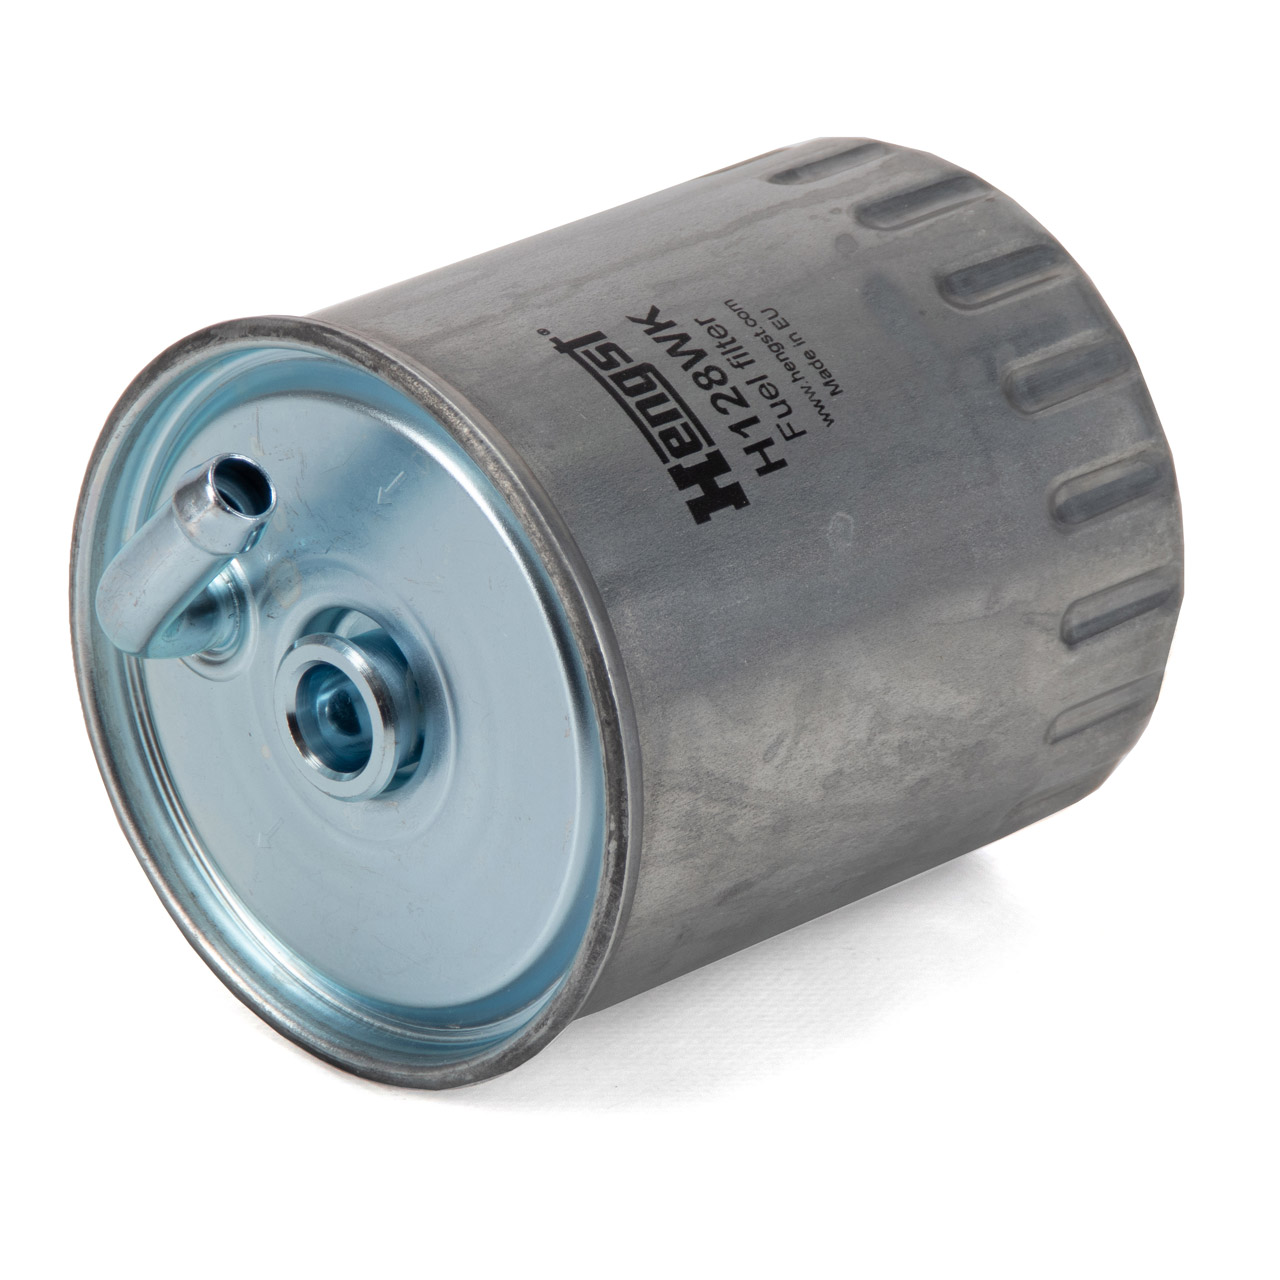 HENGST H128WK Kraftstofffilter MERCEDES W203 C209 W461 W463 W163 OM611 OM612